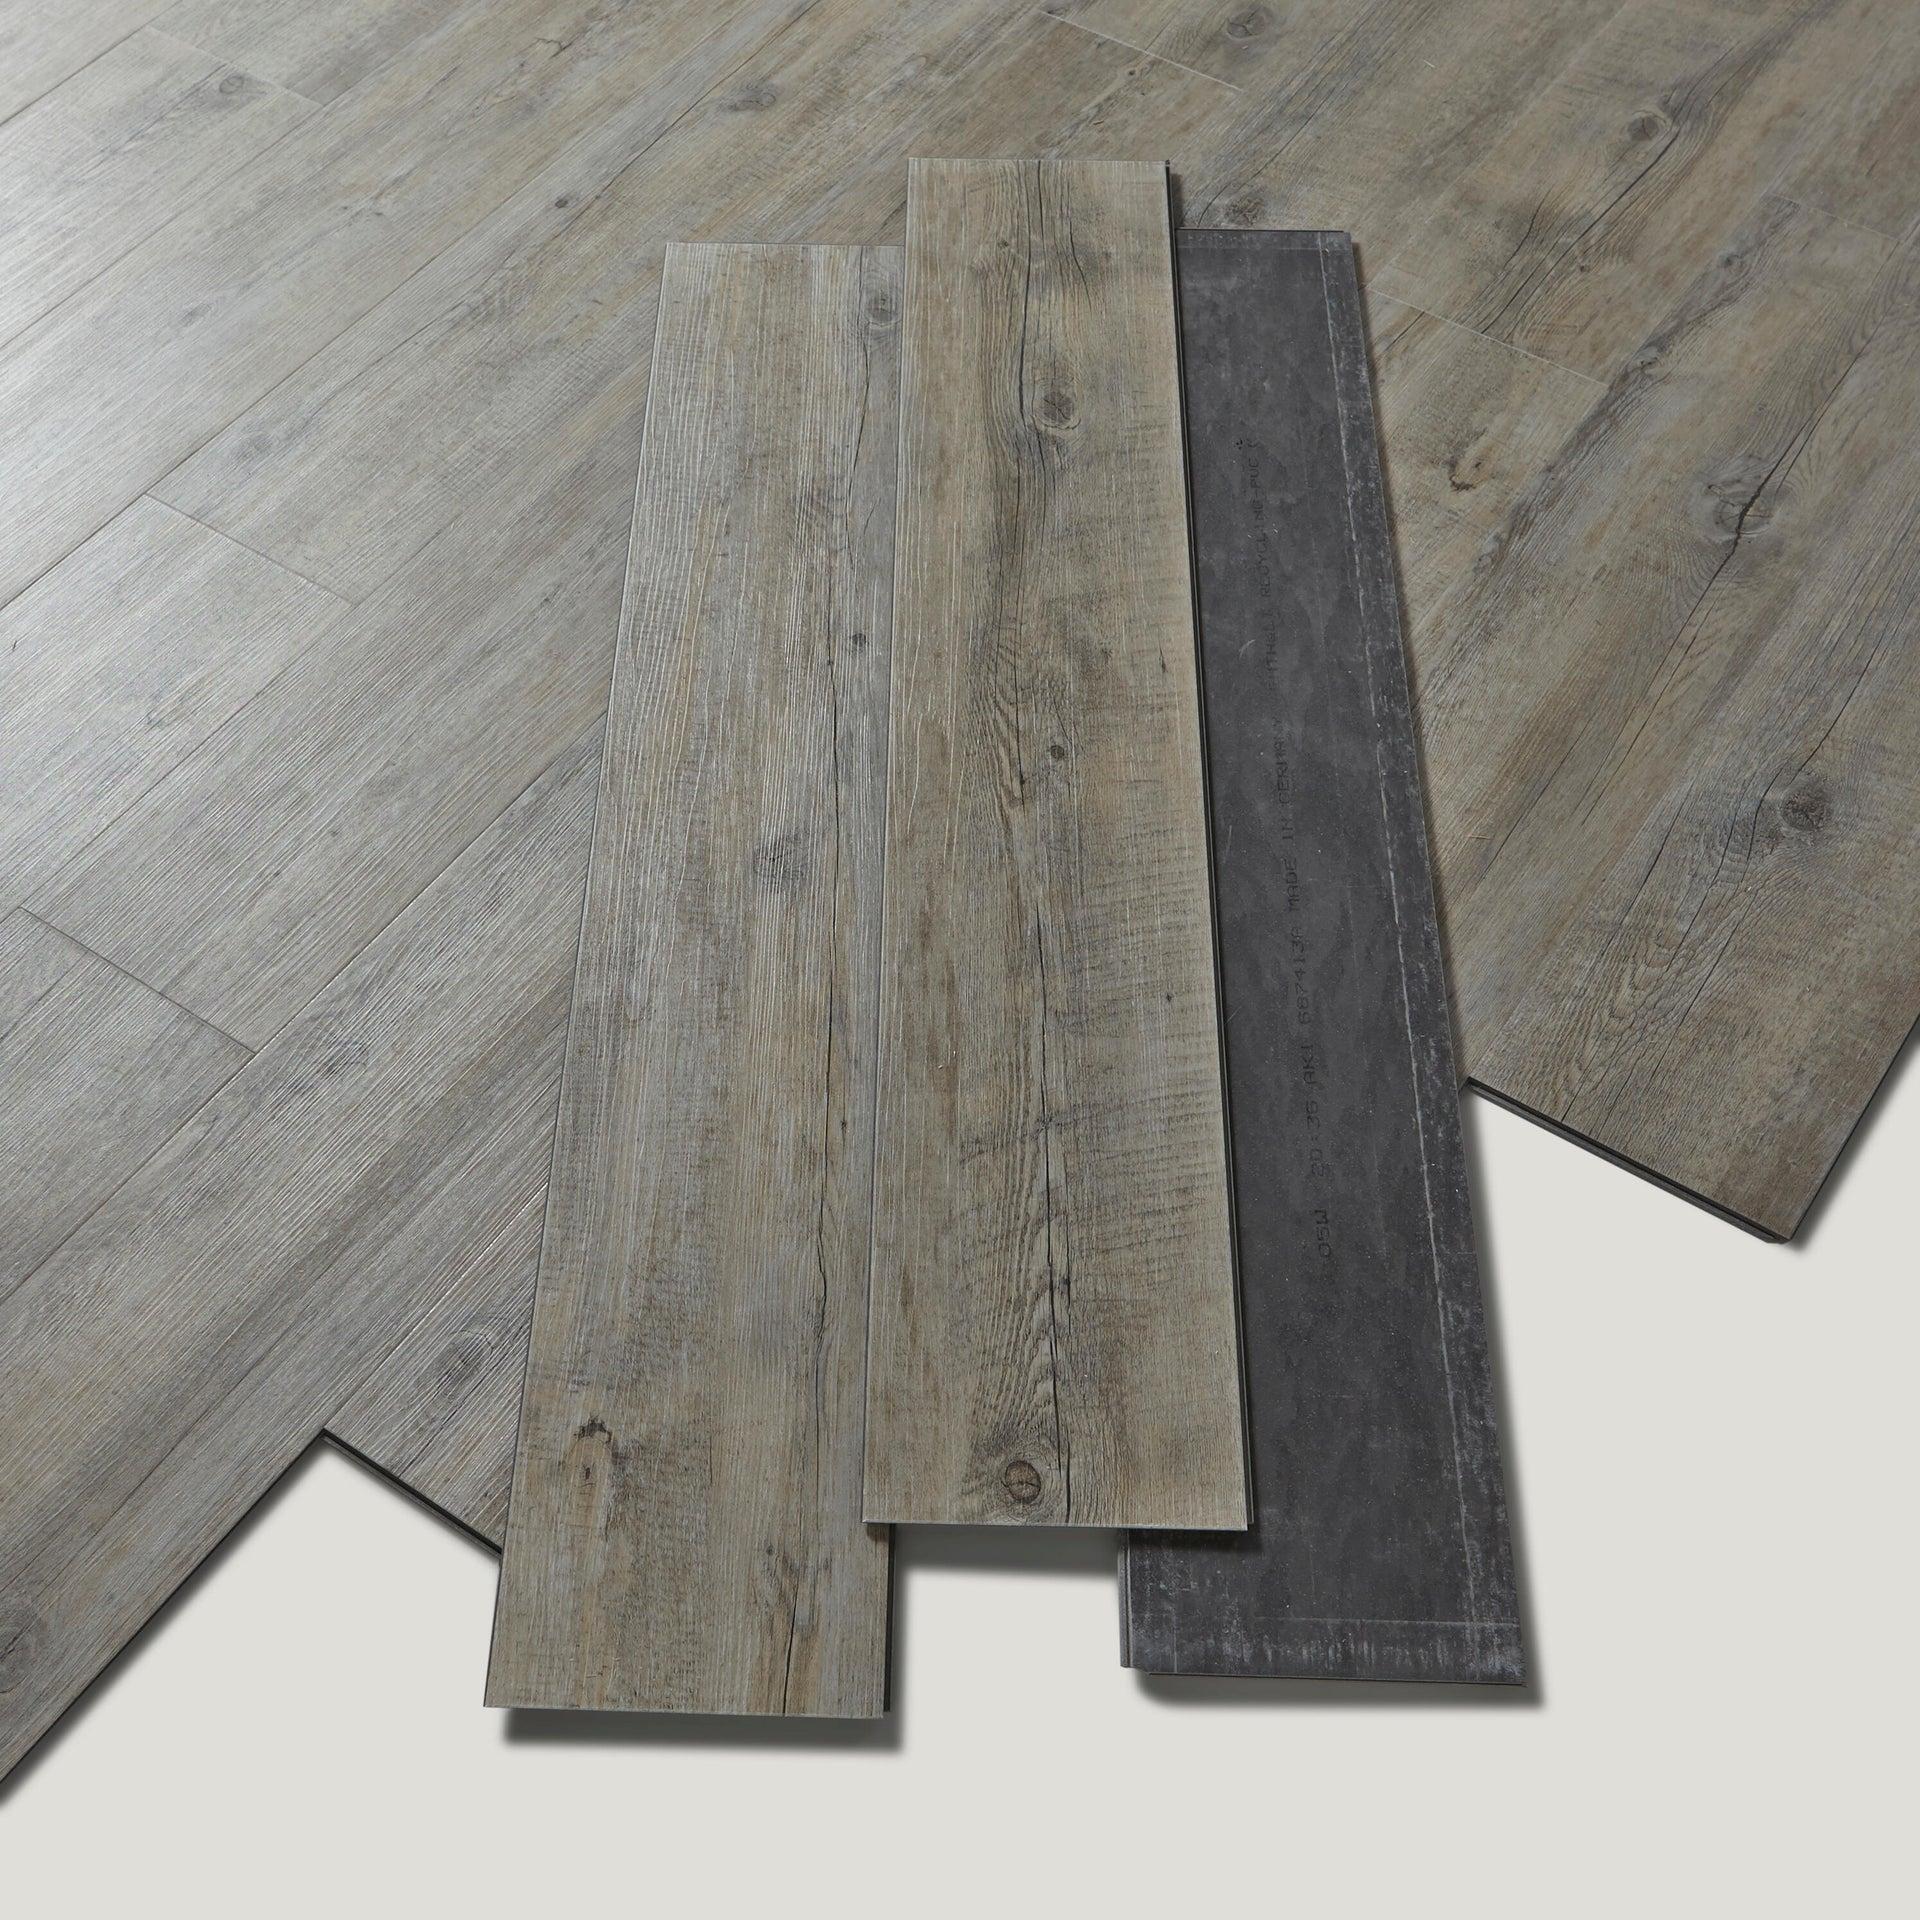 Pavimento PVC flottante clic+ Pecan Sp 4.5 mm grigio / argento - 4